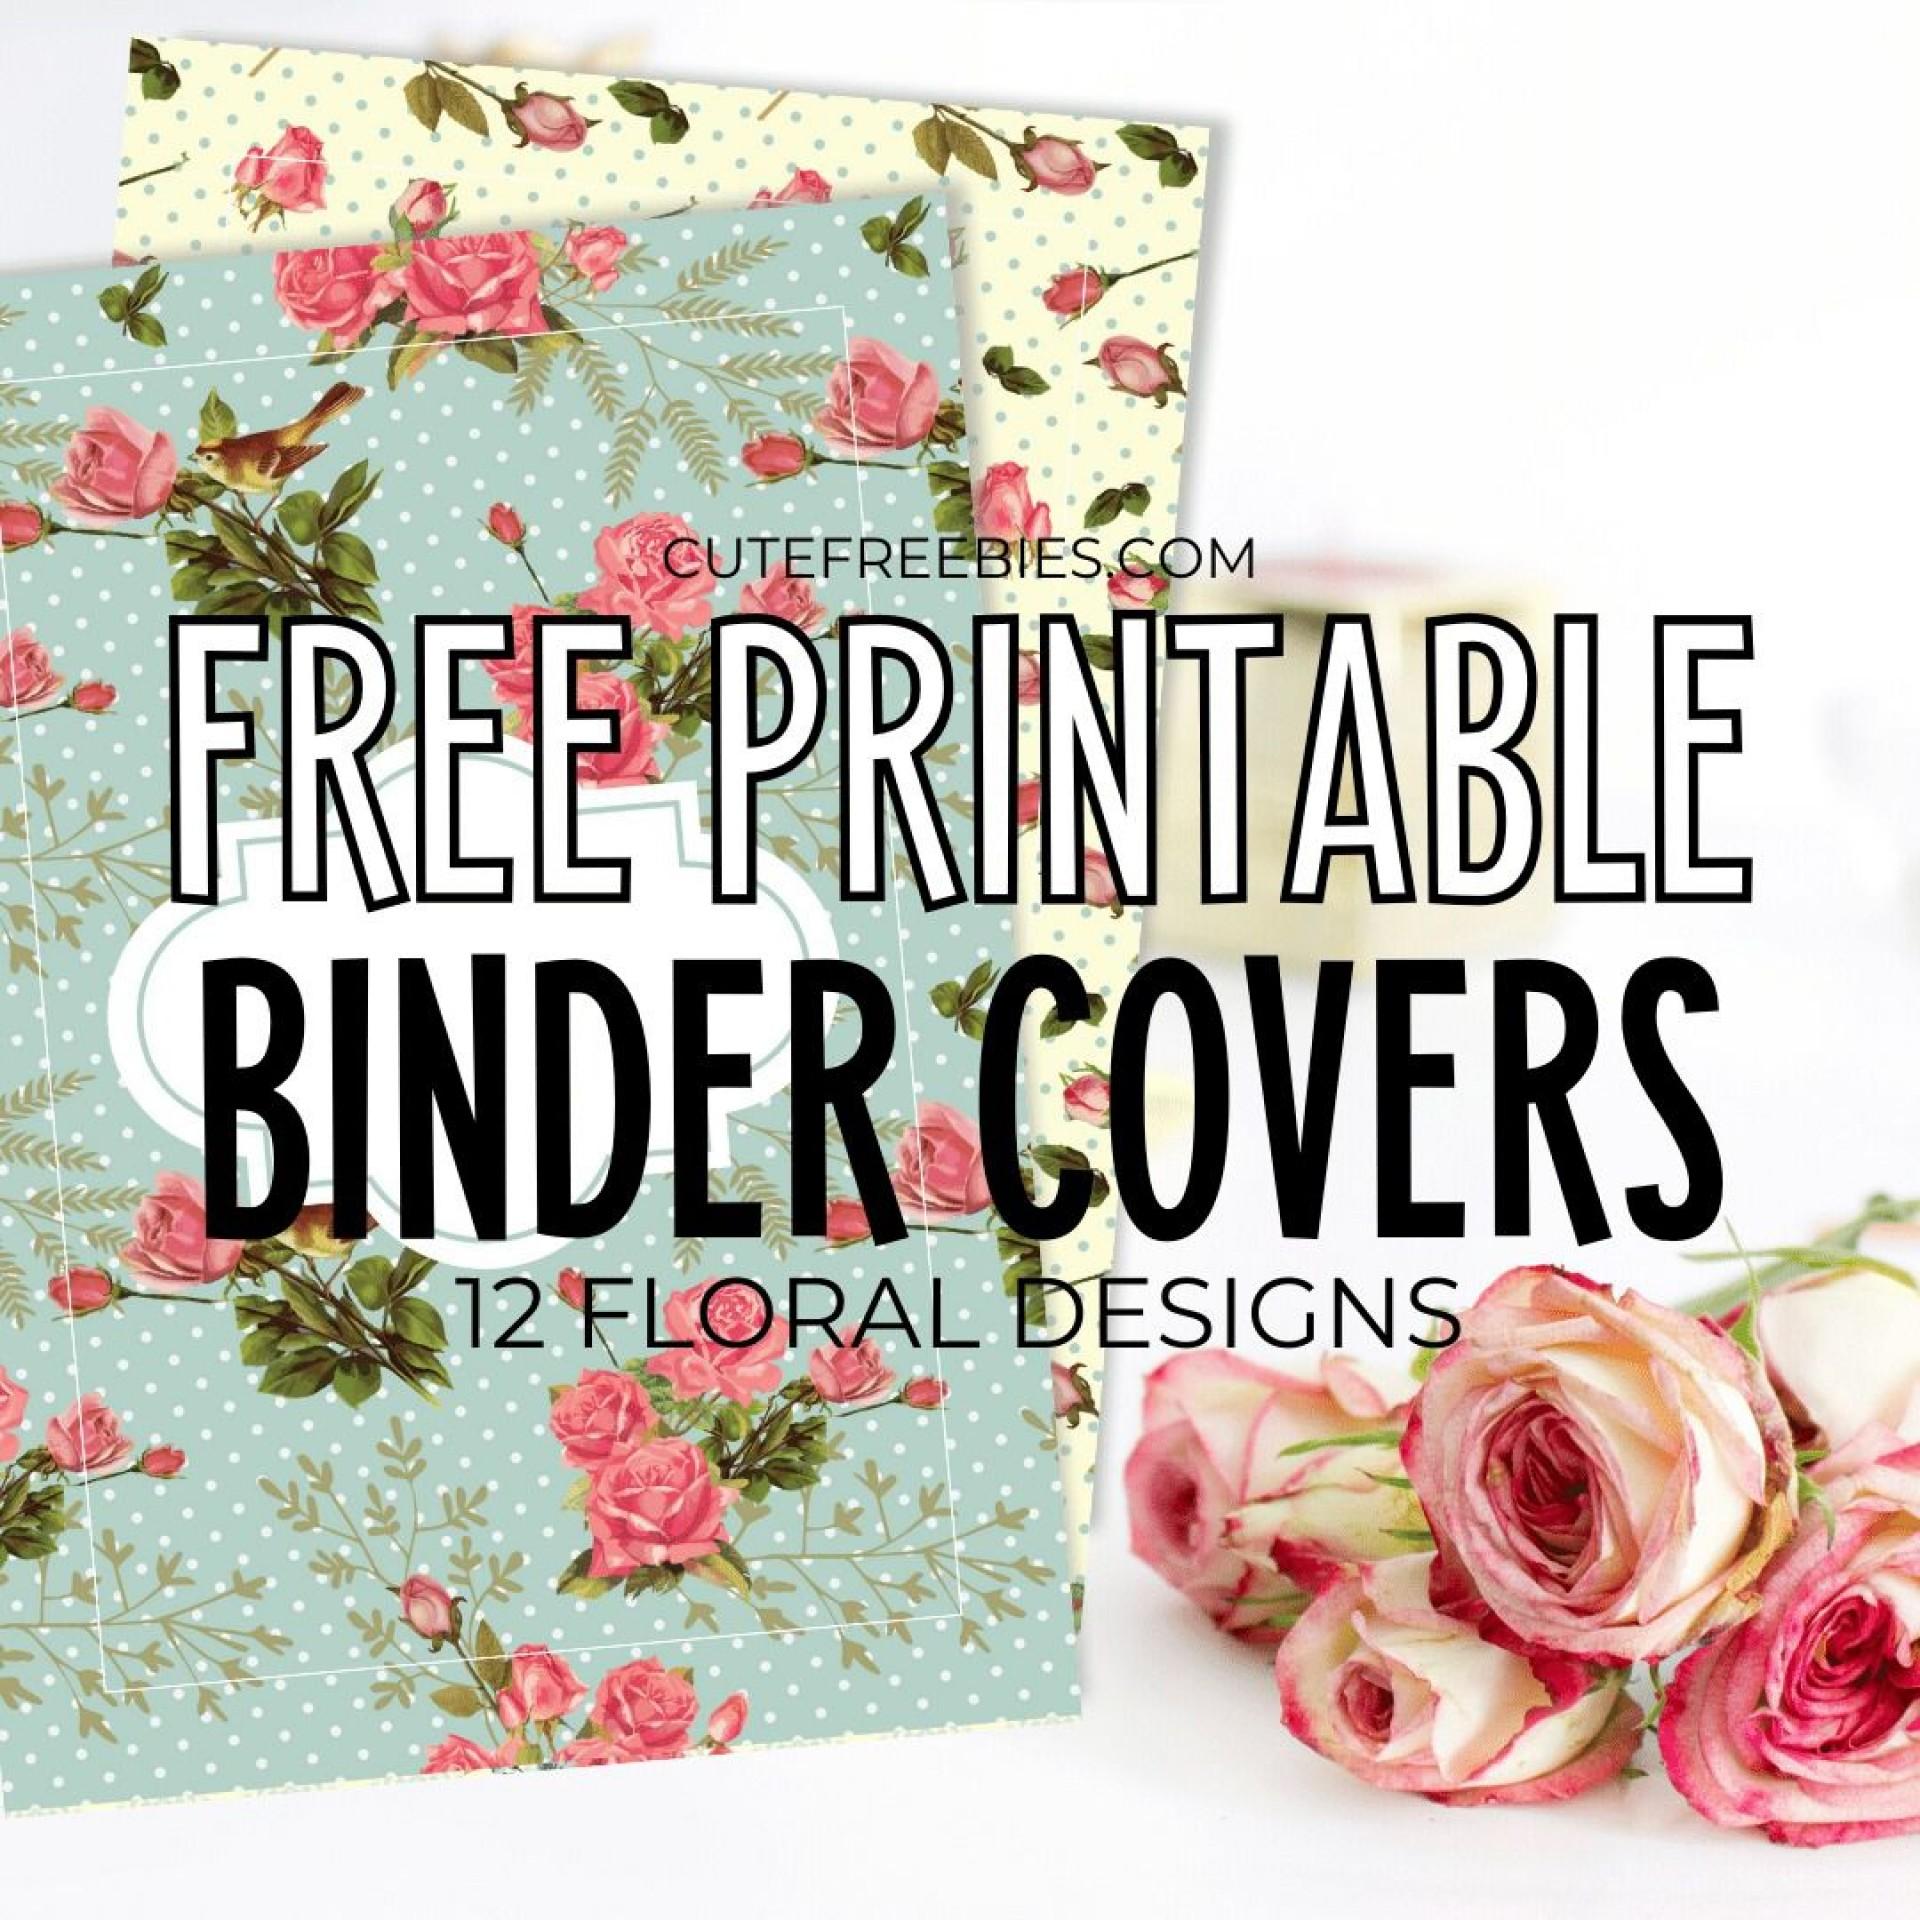 006 Stunning Free Printable Teacher Binder Template Example  Templates1920